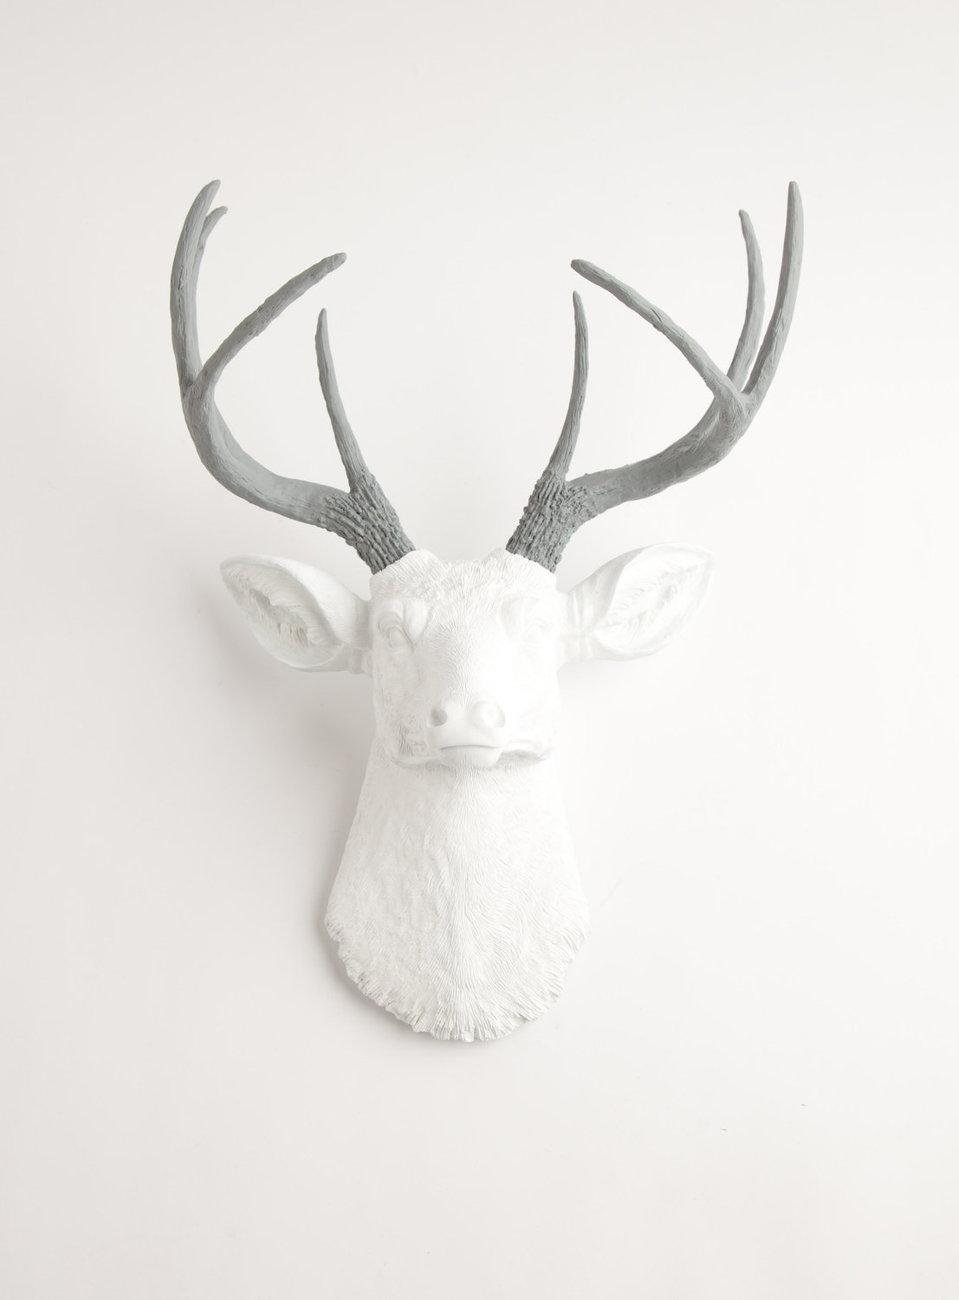 The Helena White W Gray Antlers Resin Deer Head Faux